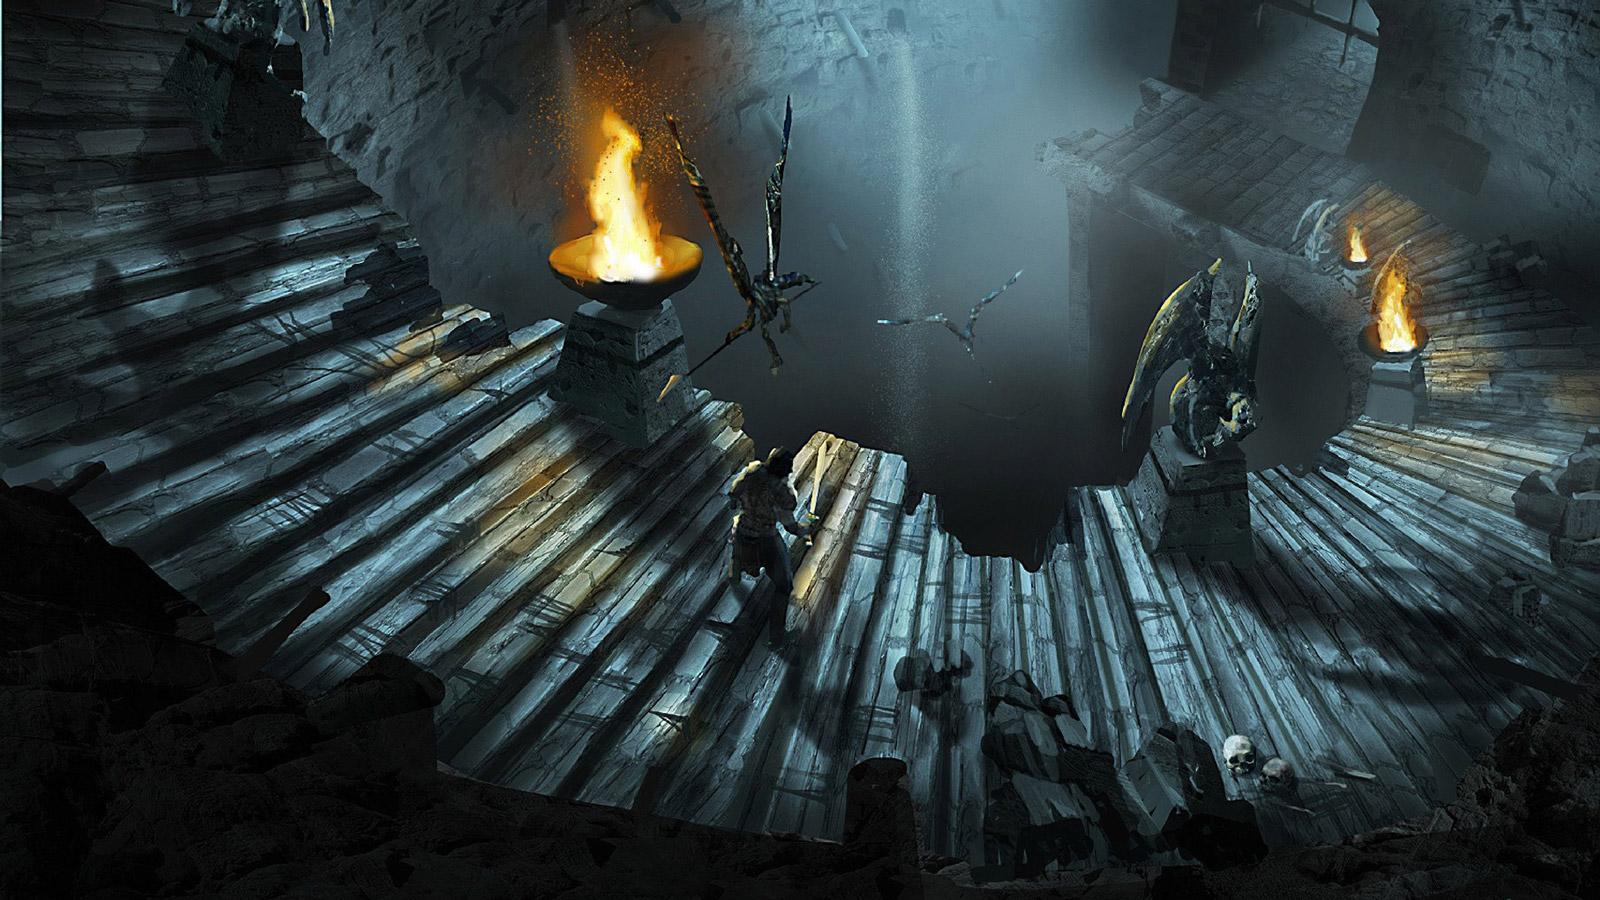 Free Dungeon Siege III Wallpaper in 1600x900